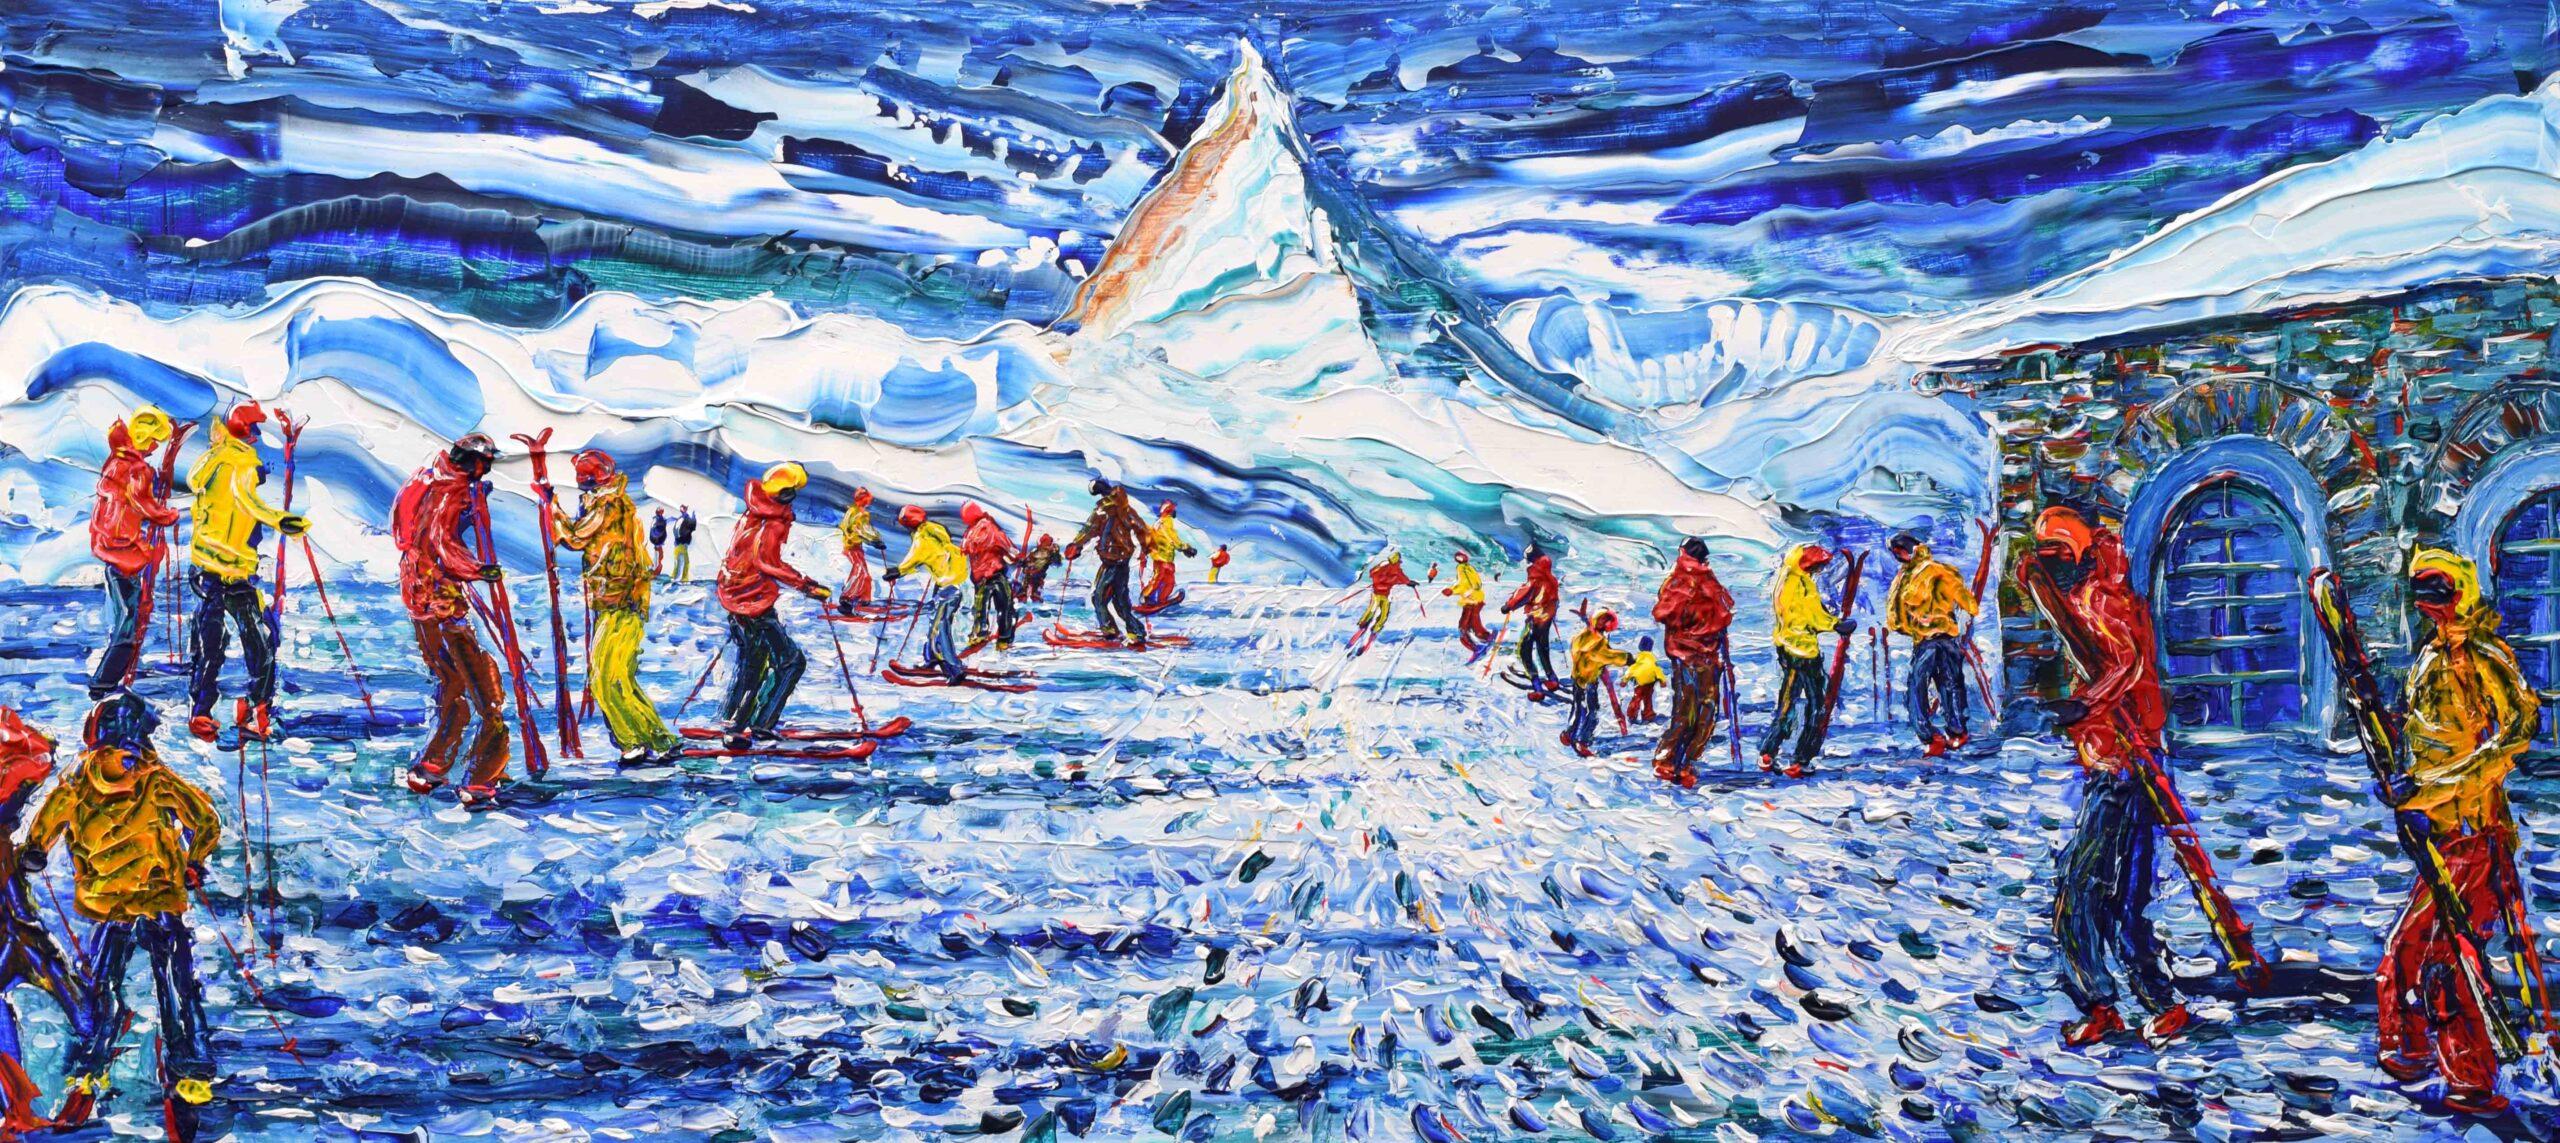 Vintage Ski Posters The Breuil-Cervinia Valtournenche Zermatt